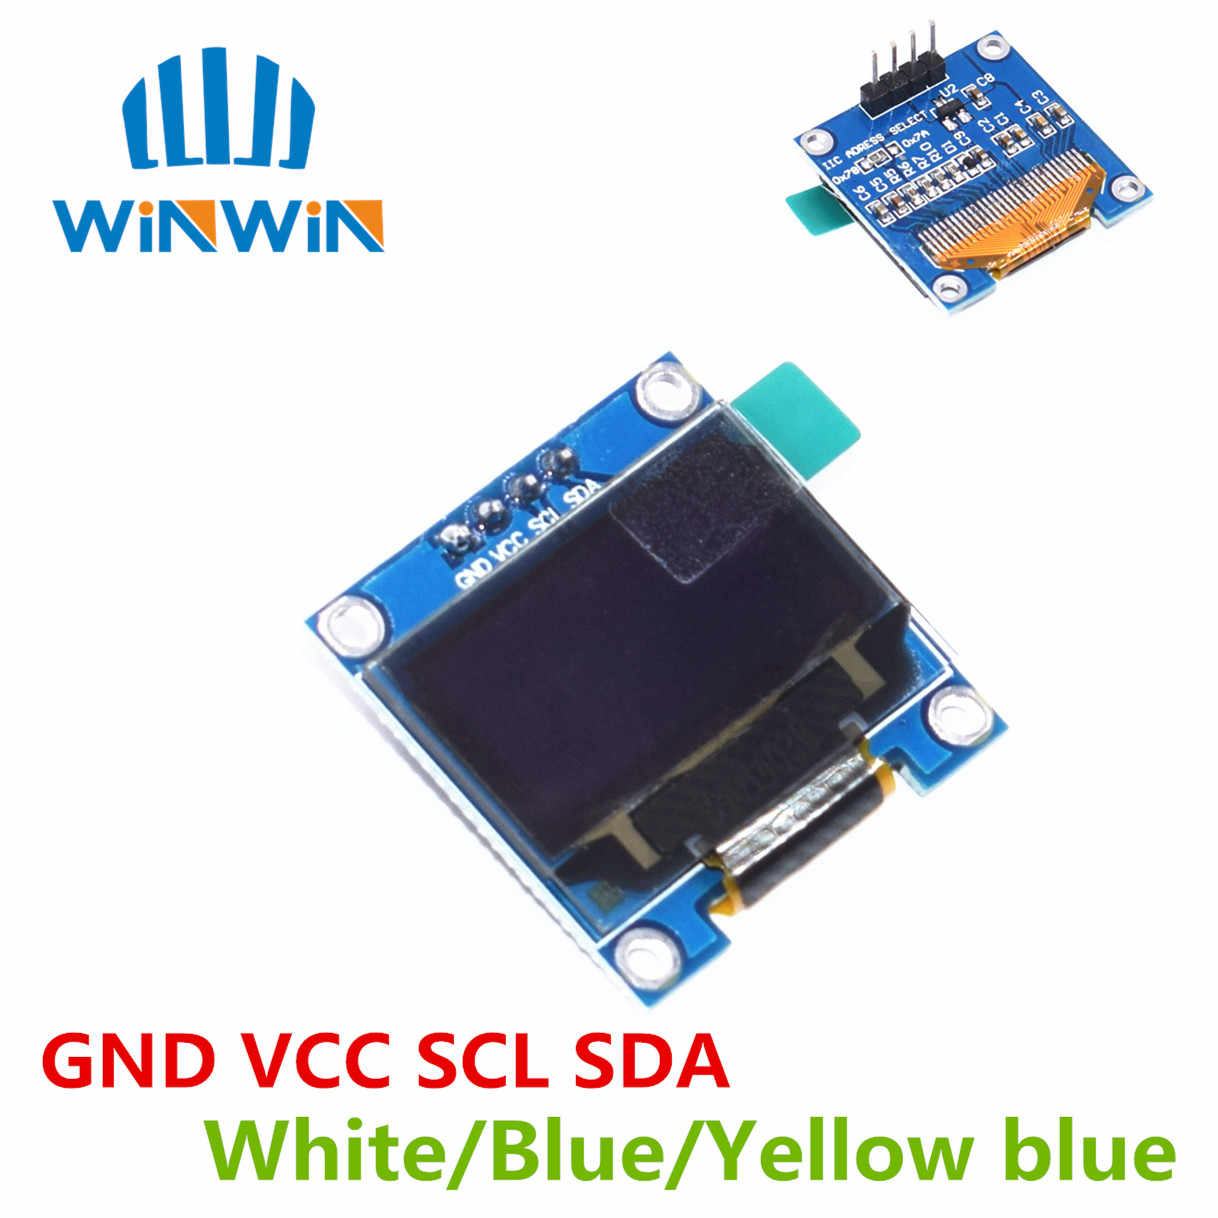 "10pcs 0.96 ""SPI/IIC I2C 통신 흰색/파란색/노란색 파란색 0.96 인치 OLED 모듈 ARDUINO 용 128X64 OLED LCD 디스플레이 모듈"